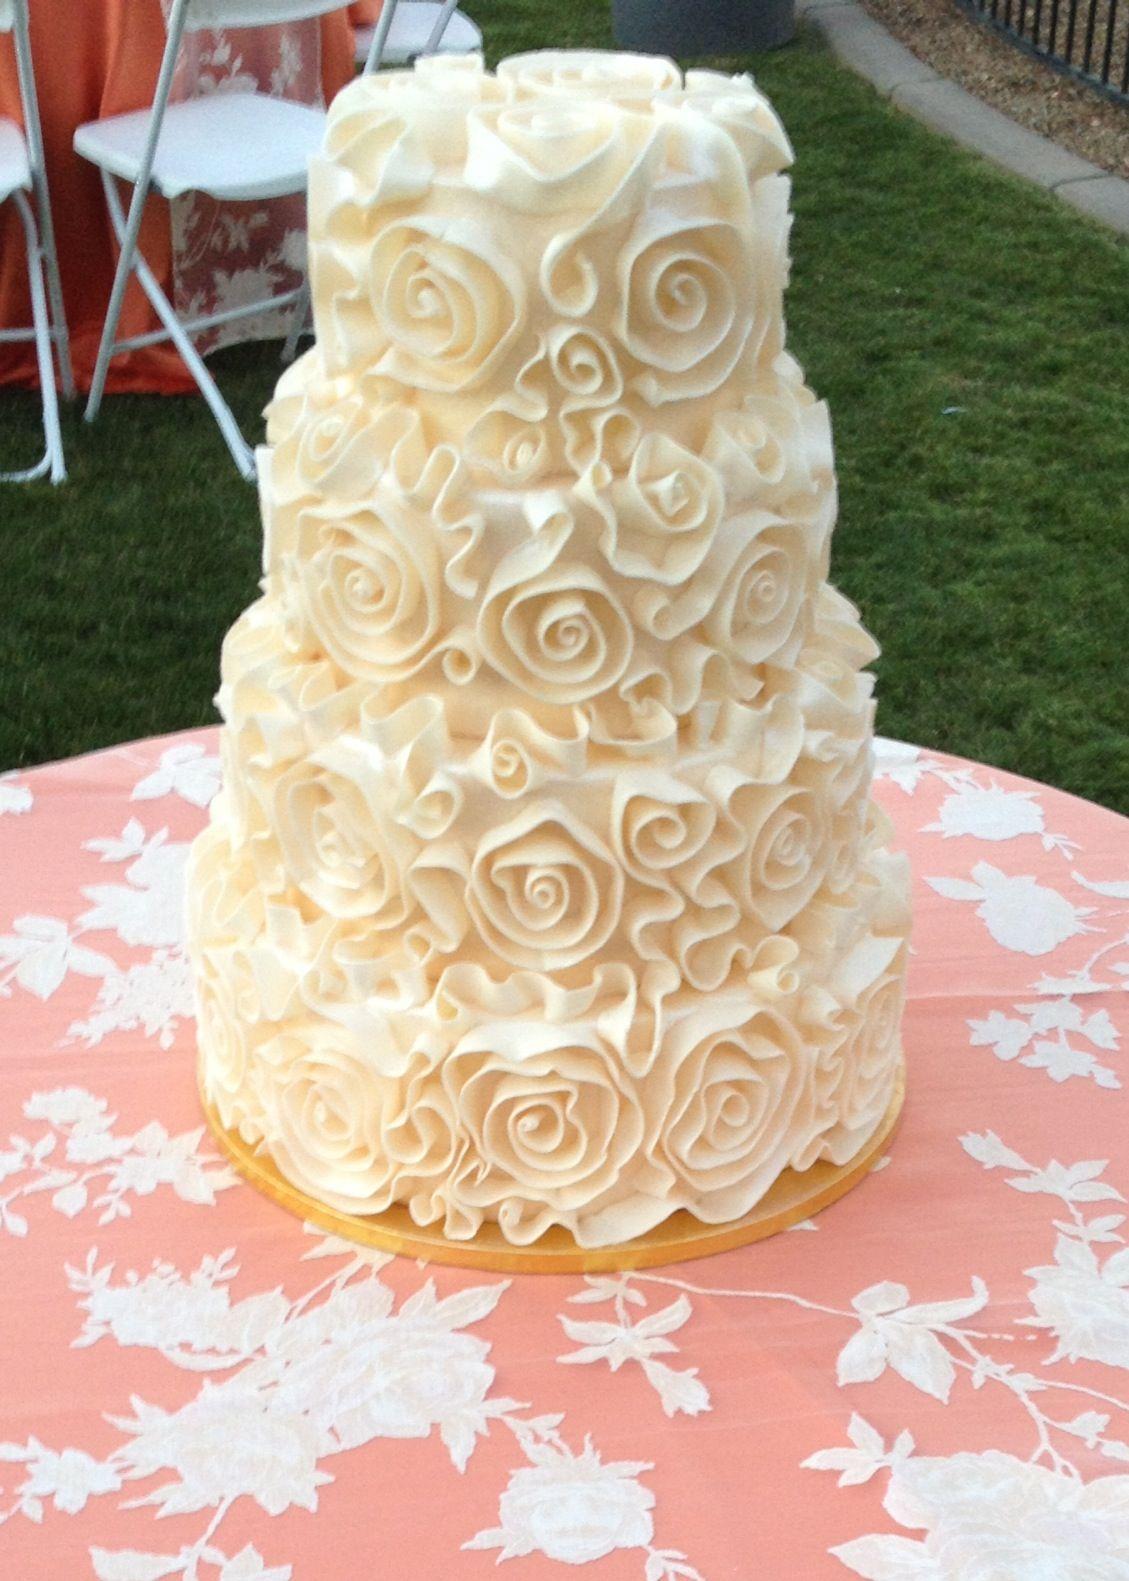 Fondant rosette wedding cake by My Sisters Cakes in Gilbert, AZ ...